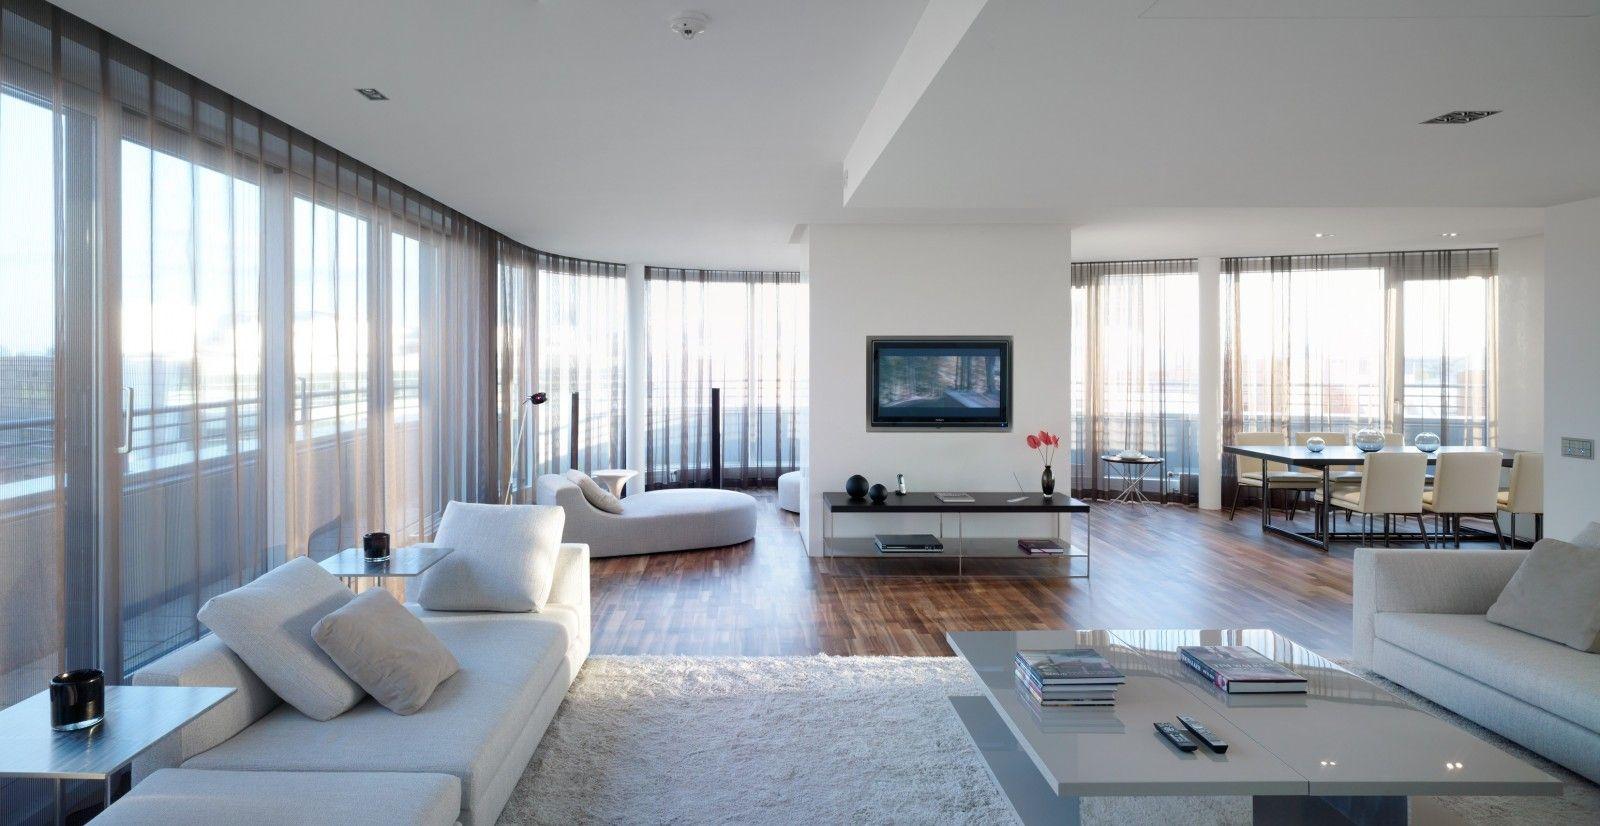 Penthouse Berlin best luxury penthouse apartments things condominium estate san